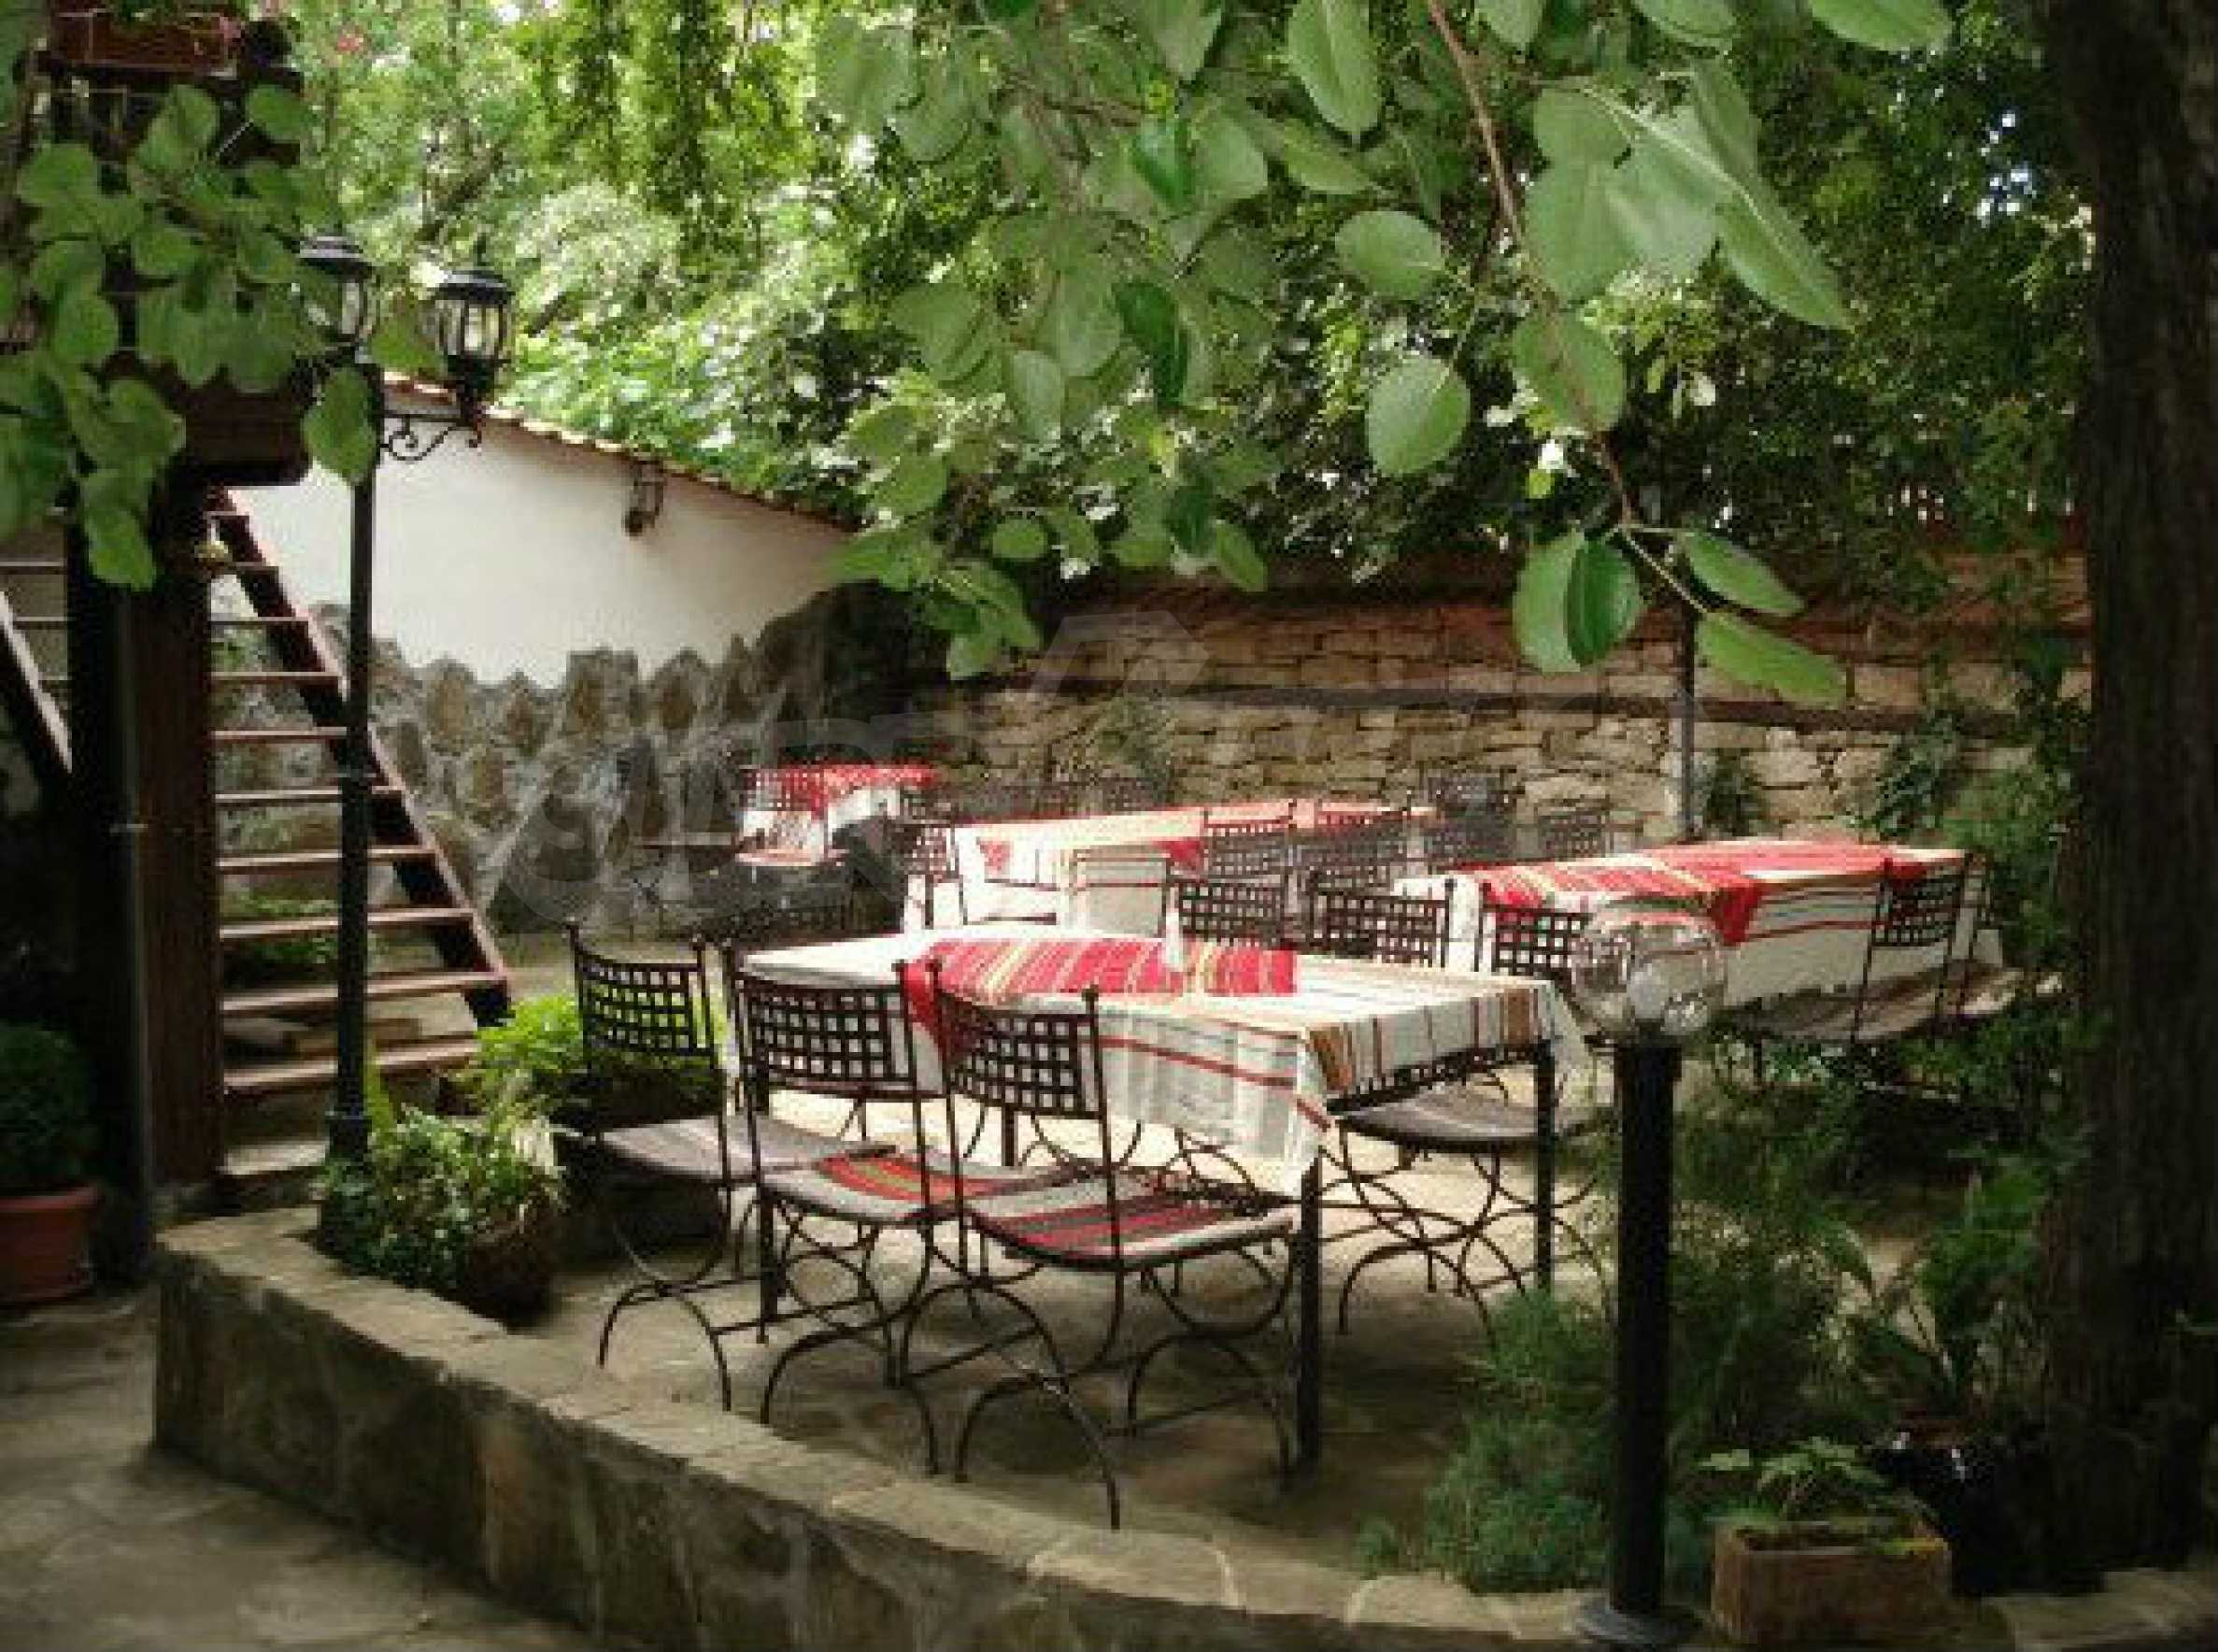 Hotelanlage mit Restaurant am Ufer des Flusses Osam in Lovech 50